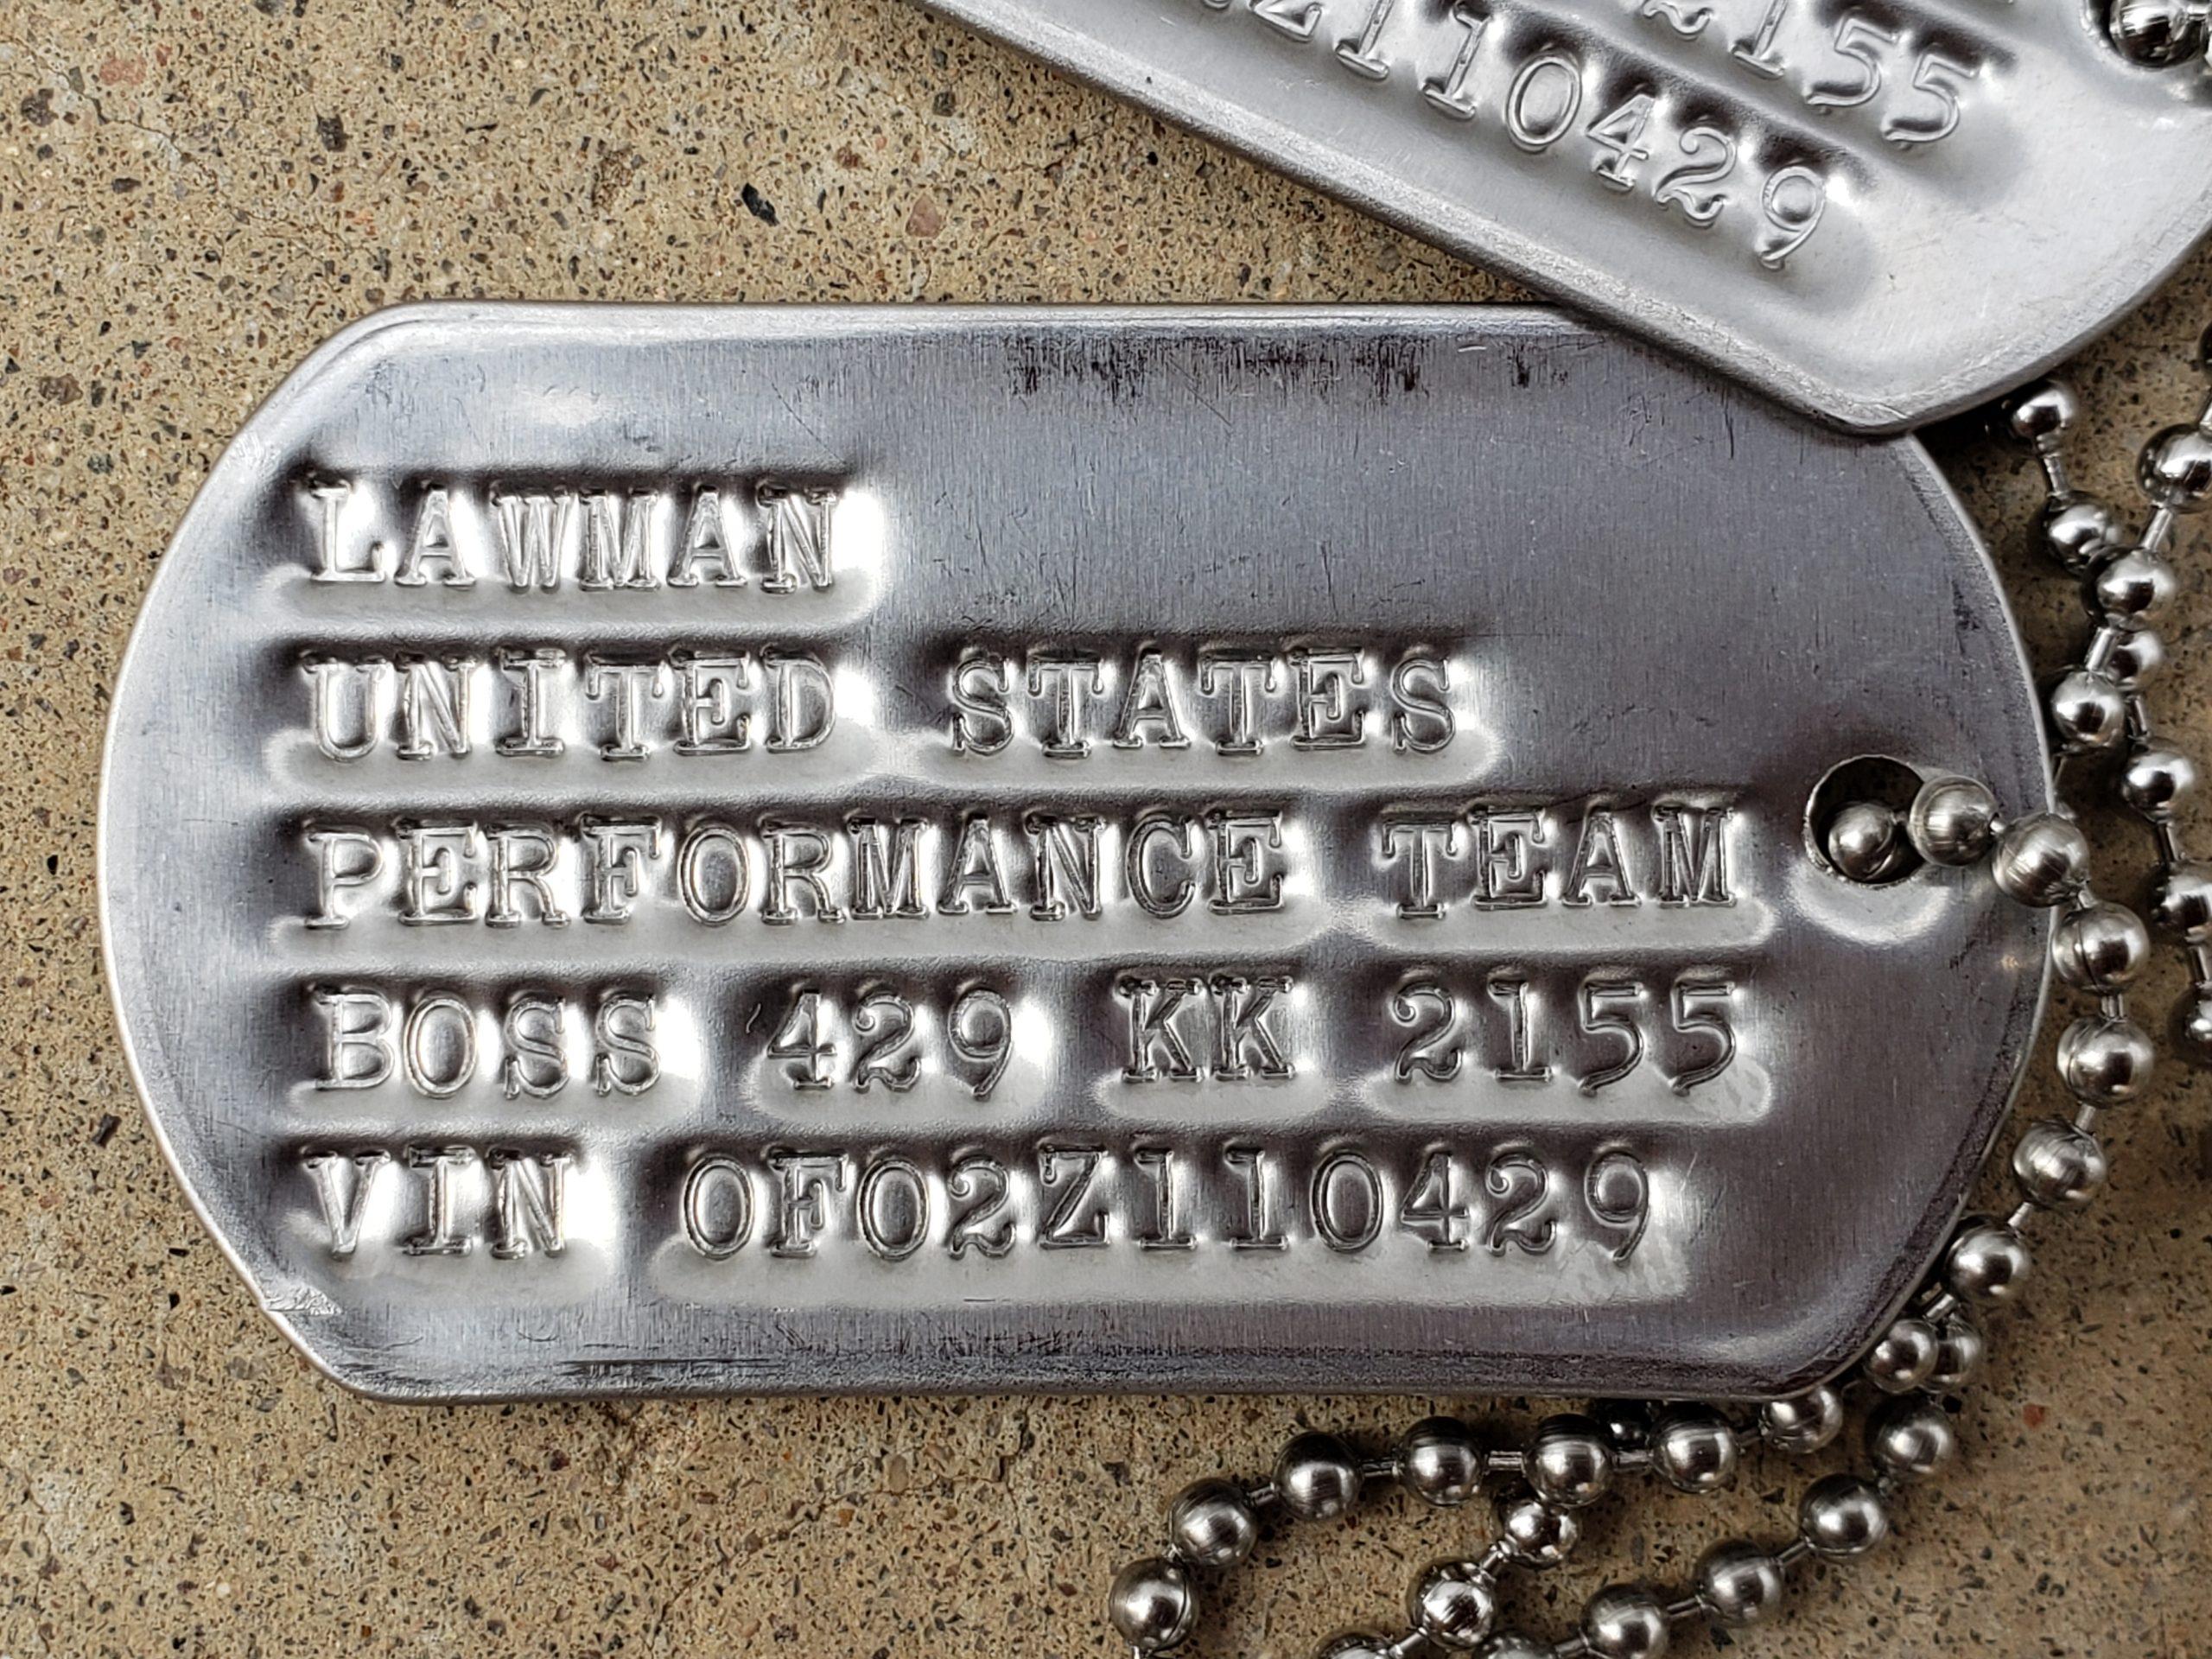 Lawman Boss 429 Ford Mustang dog tag detail close